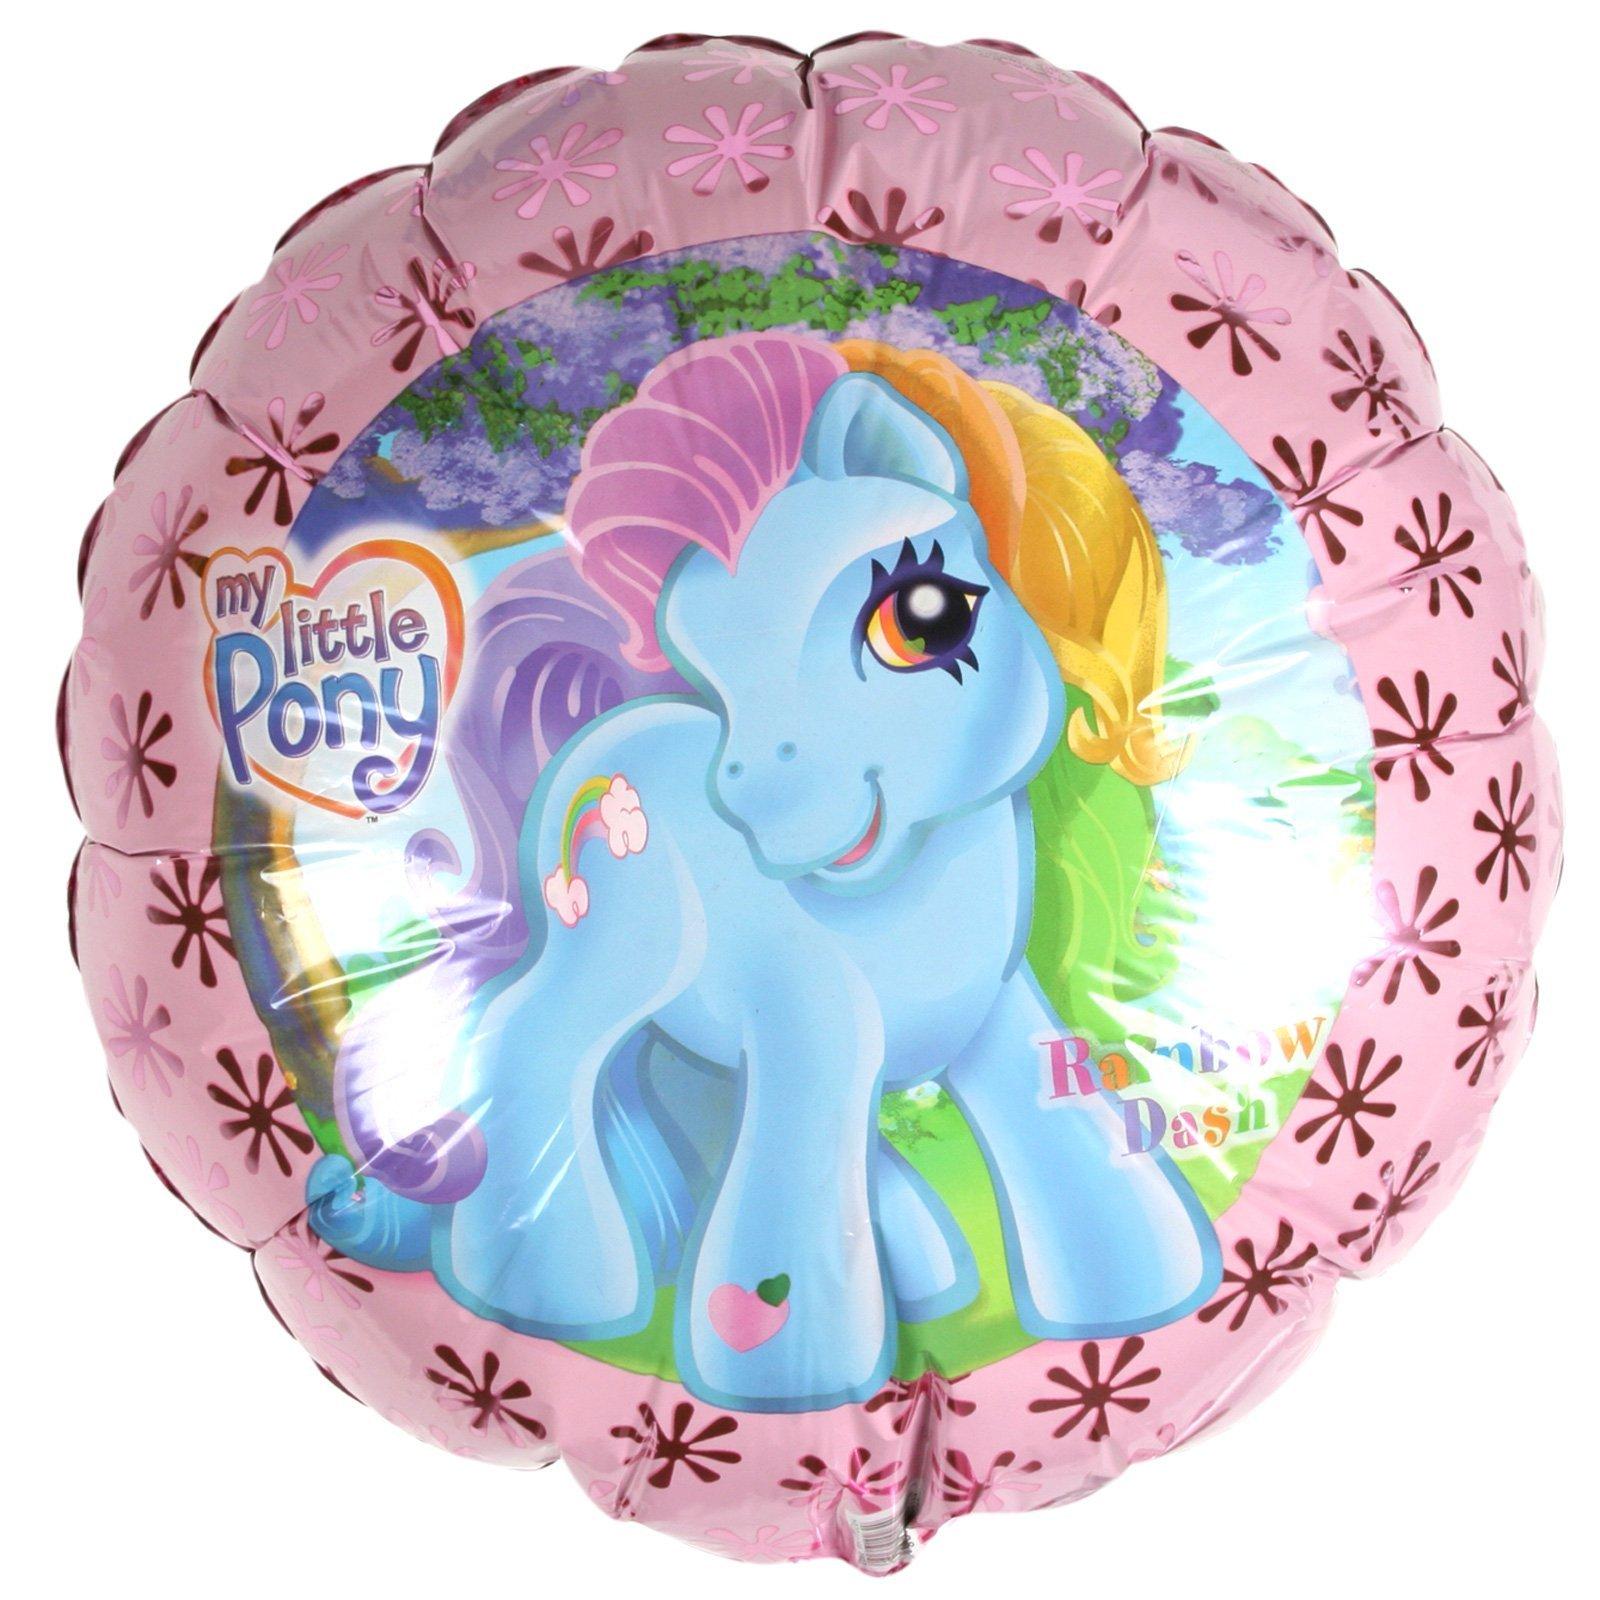 My Little Pony 18in Balloon